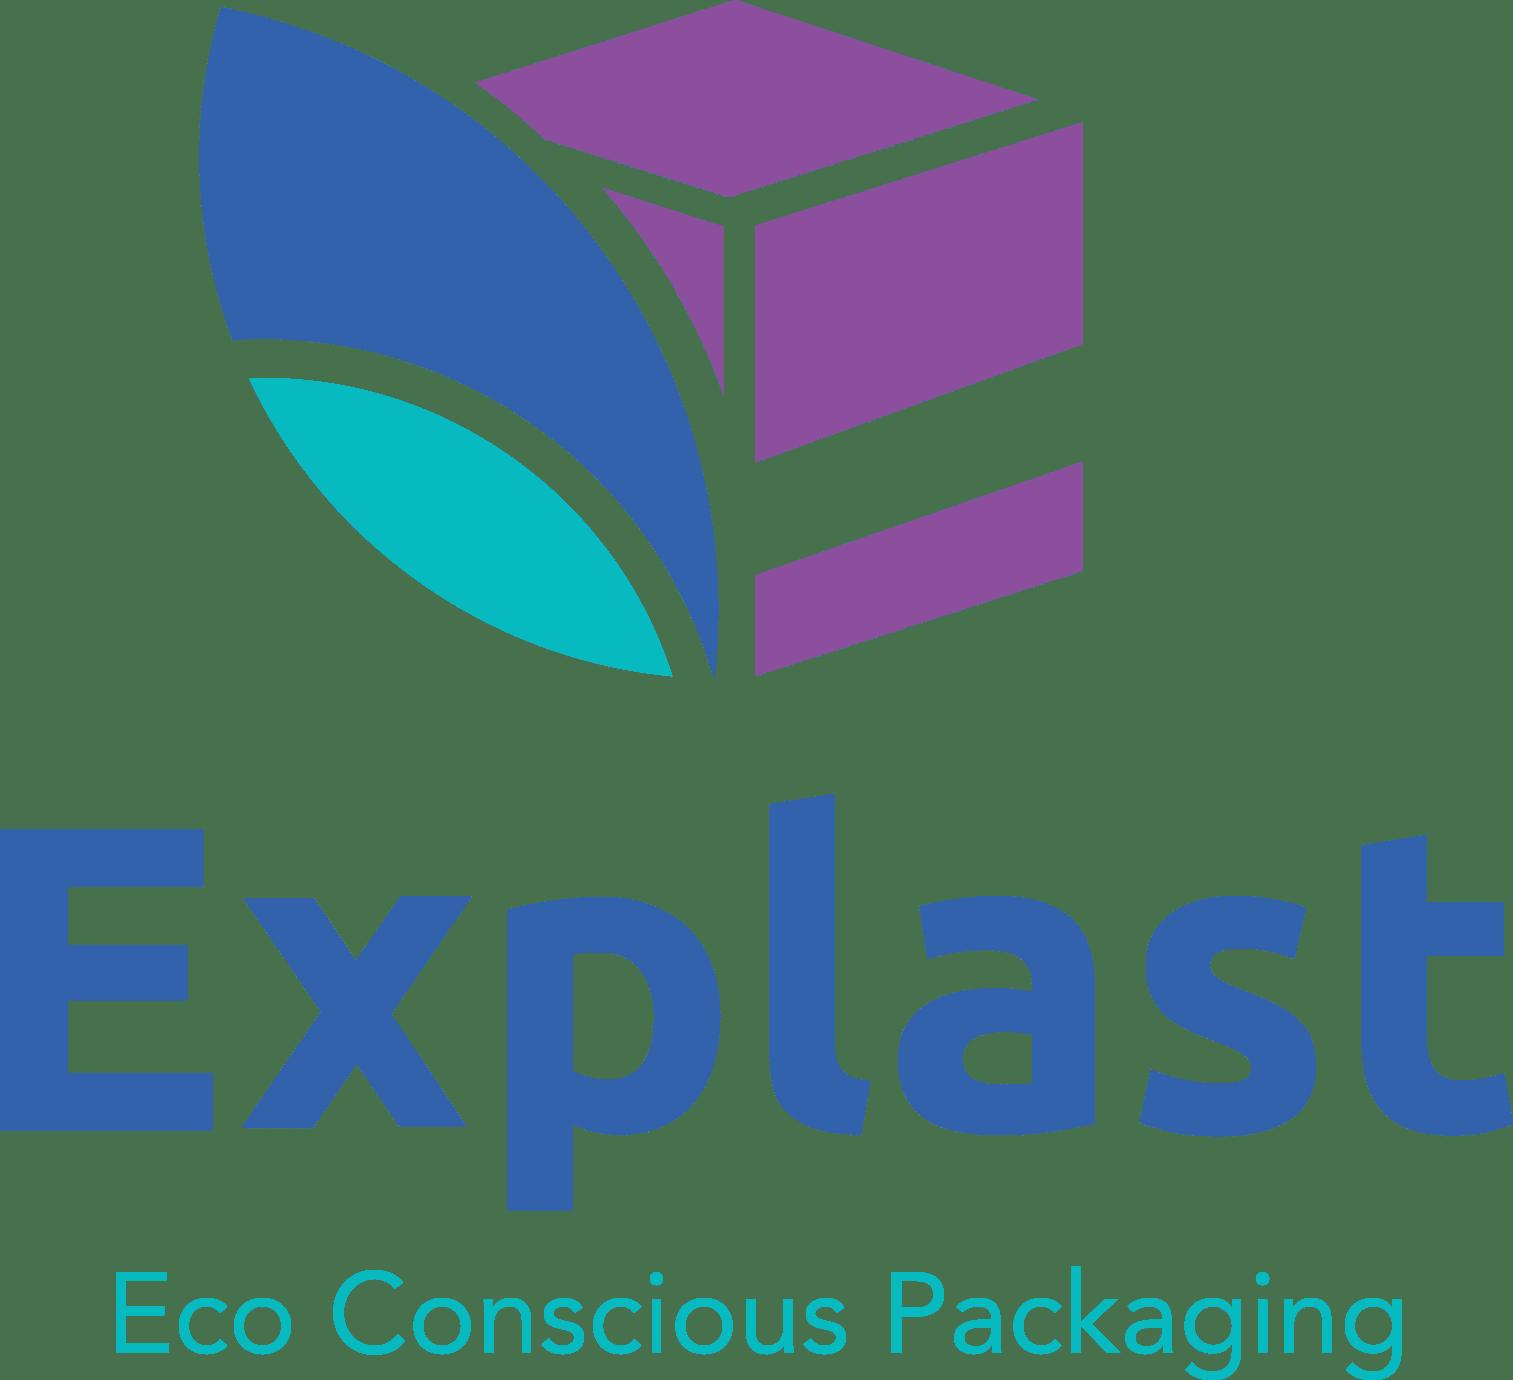 Explast